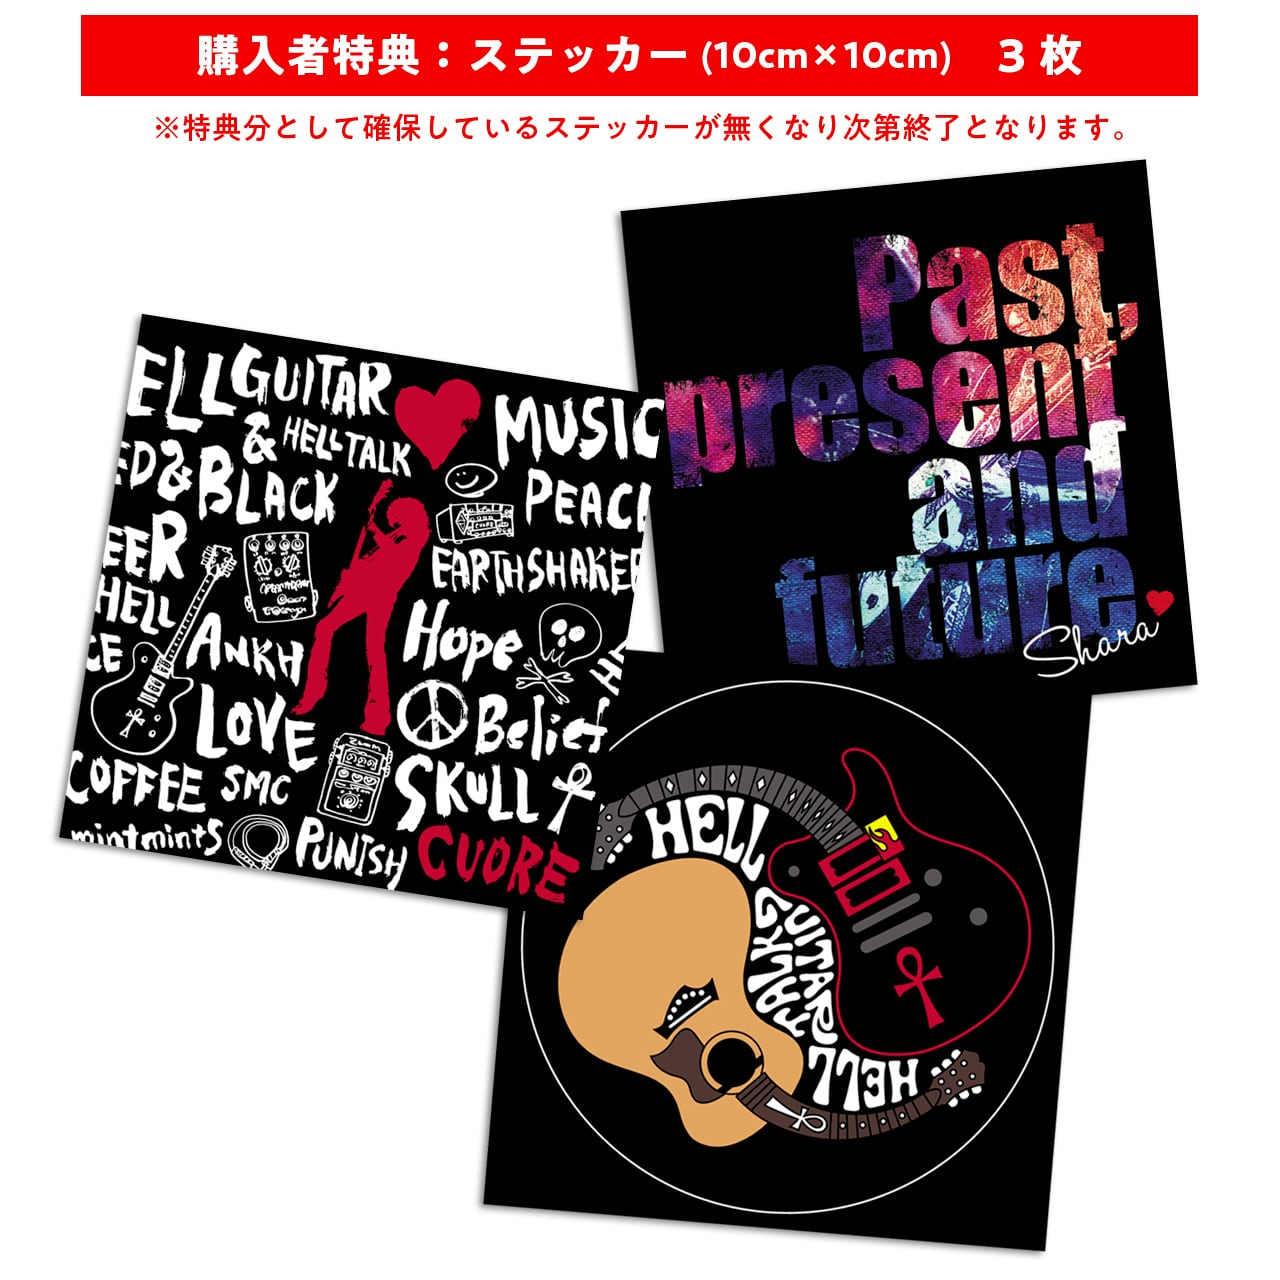 CD:『EARTHSHAKER』SMC +特典付 - 画像2